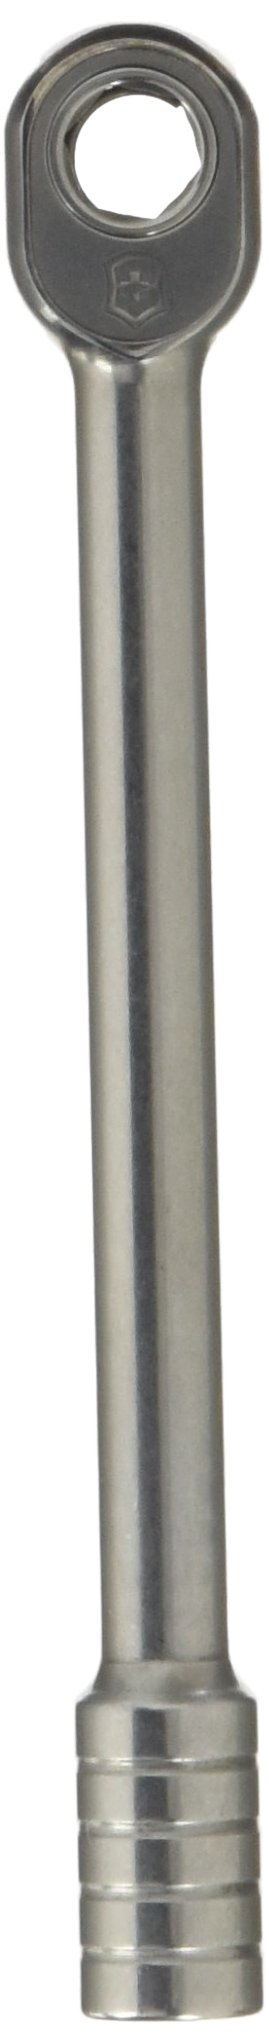 Victorinox Wrench for SwissTool